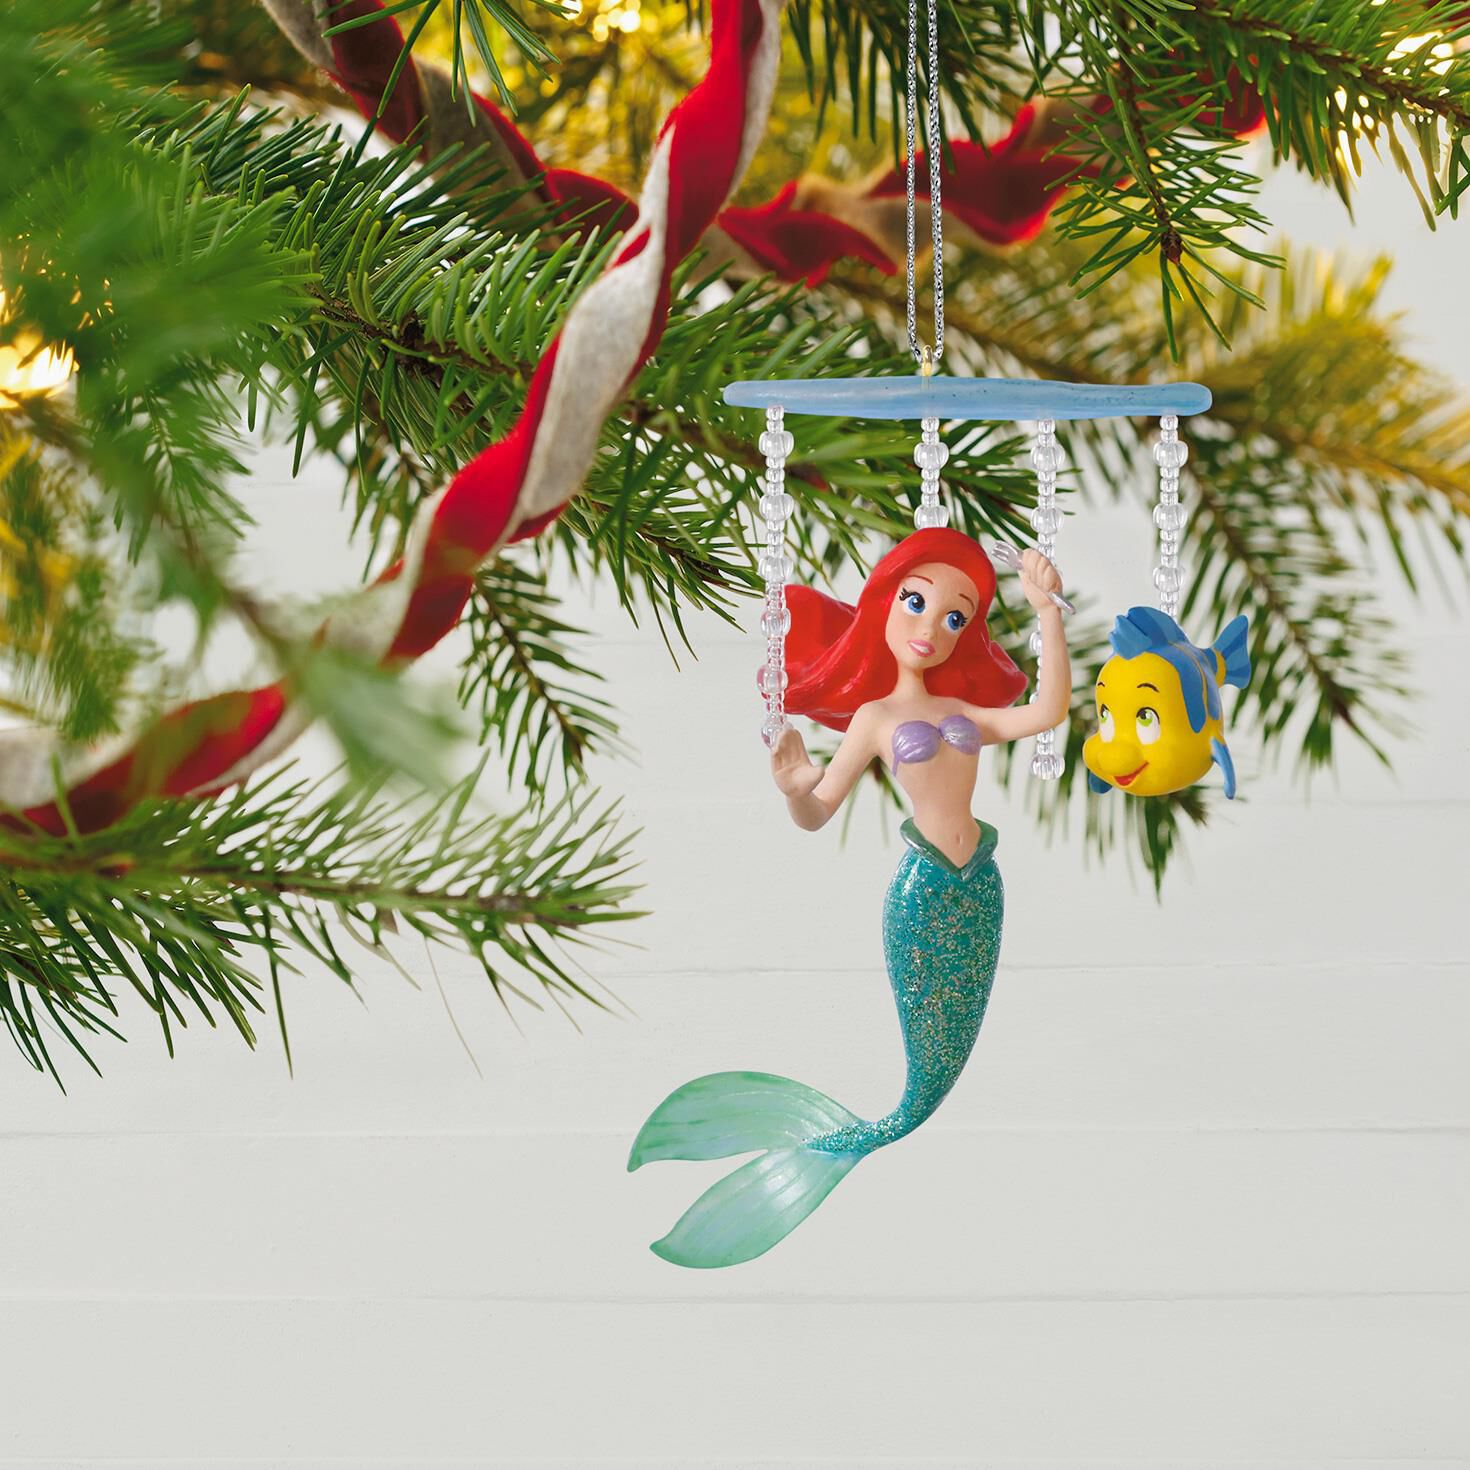 Disney The Little Mermaid Ariel's World Ornament - Keepsake ...